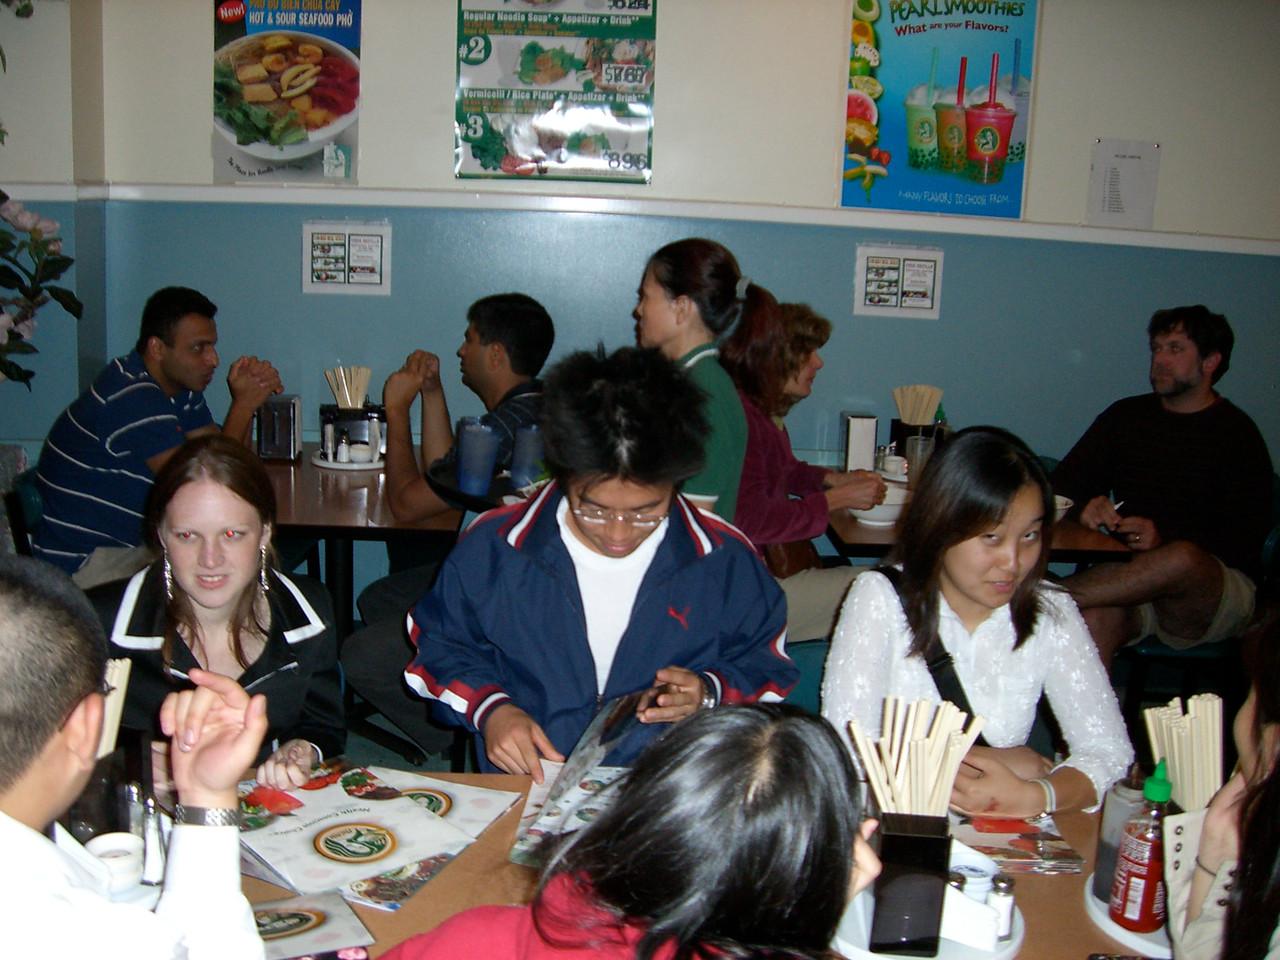 2005 10 22 Sat - Emily Dalton fries David with laser sight, track-star Hyungsoo Kim, evil-eye Esther Kang